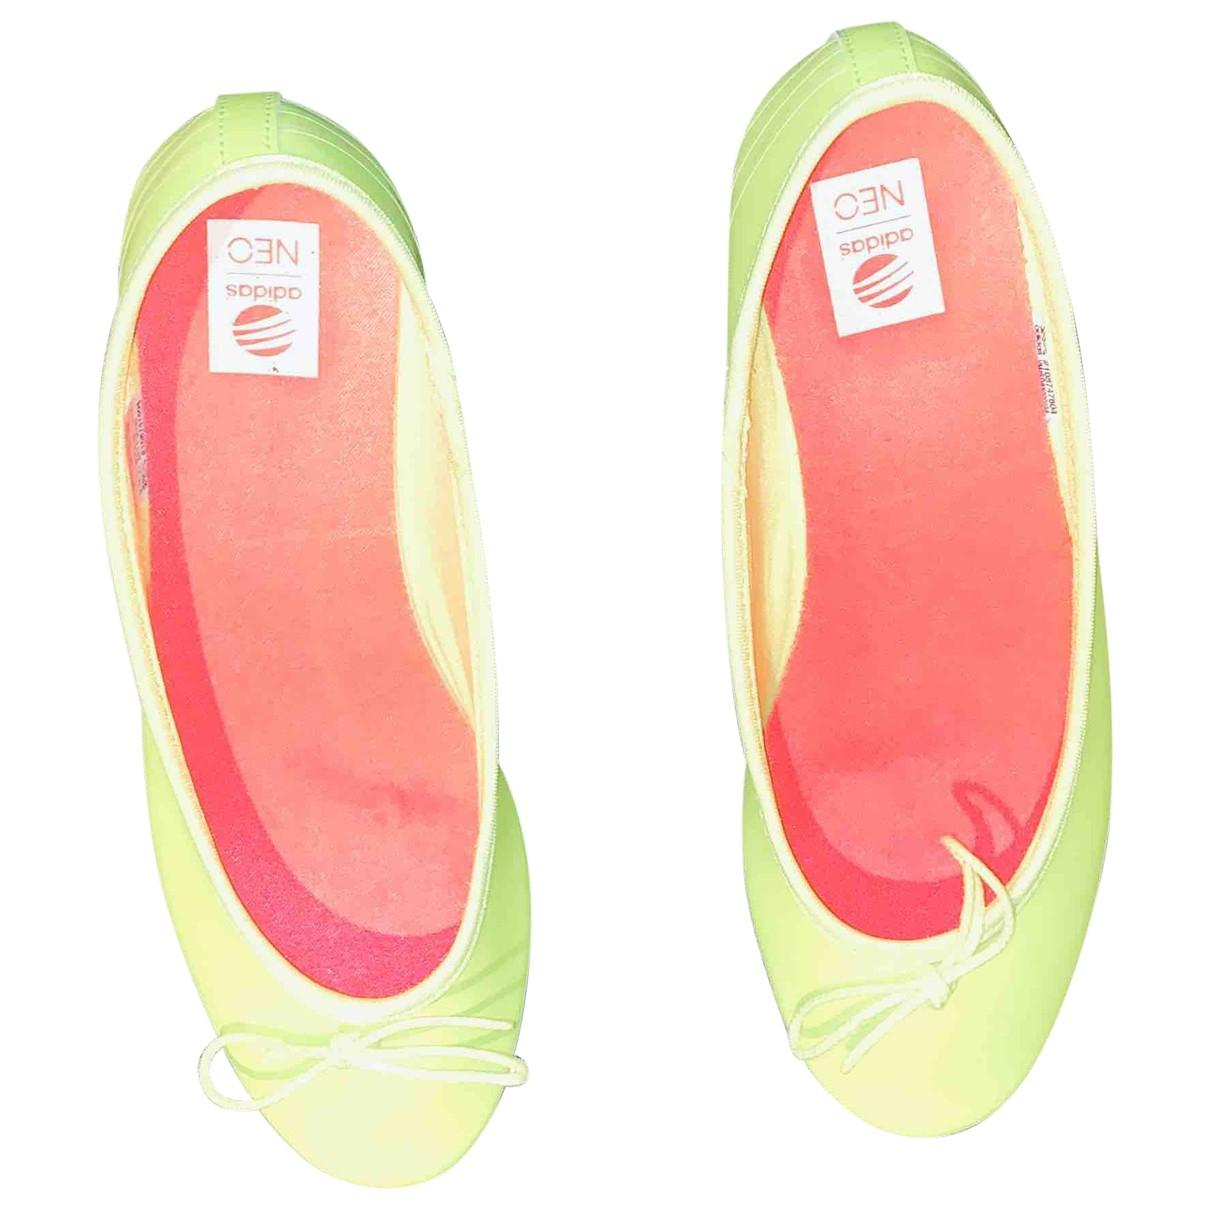 Adidas \N Ballerinas in  Gelb Lackleder